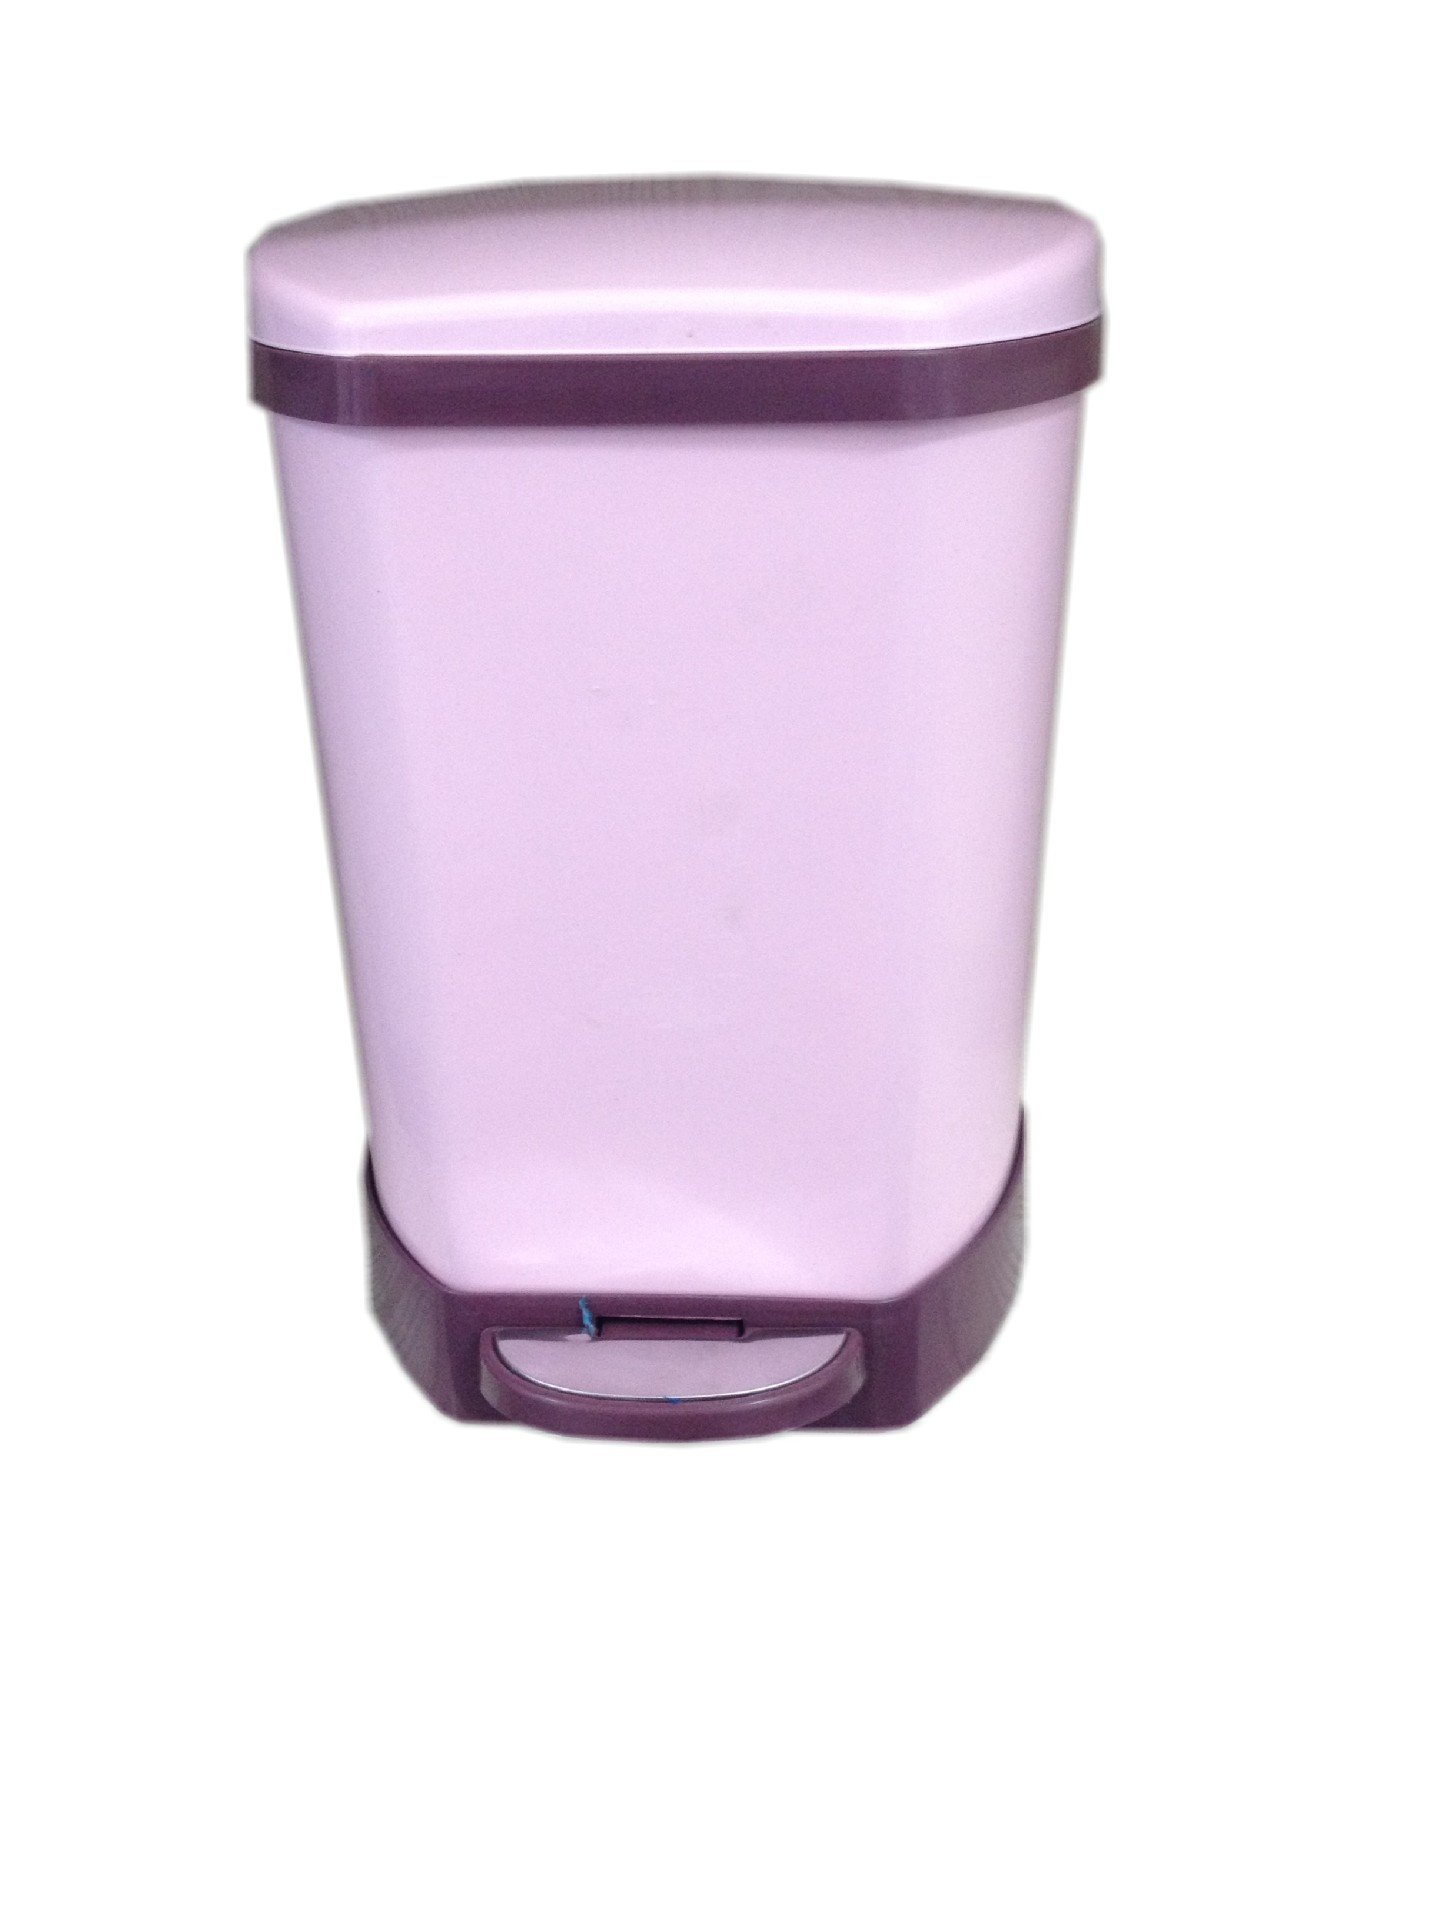 Dustbins Xiuxiutian Plastic fold foot health barrels 282428cm, Style 3